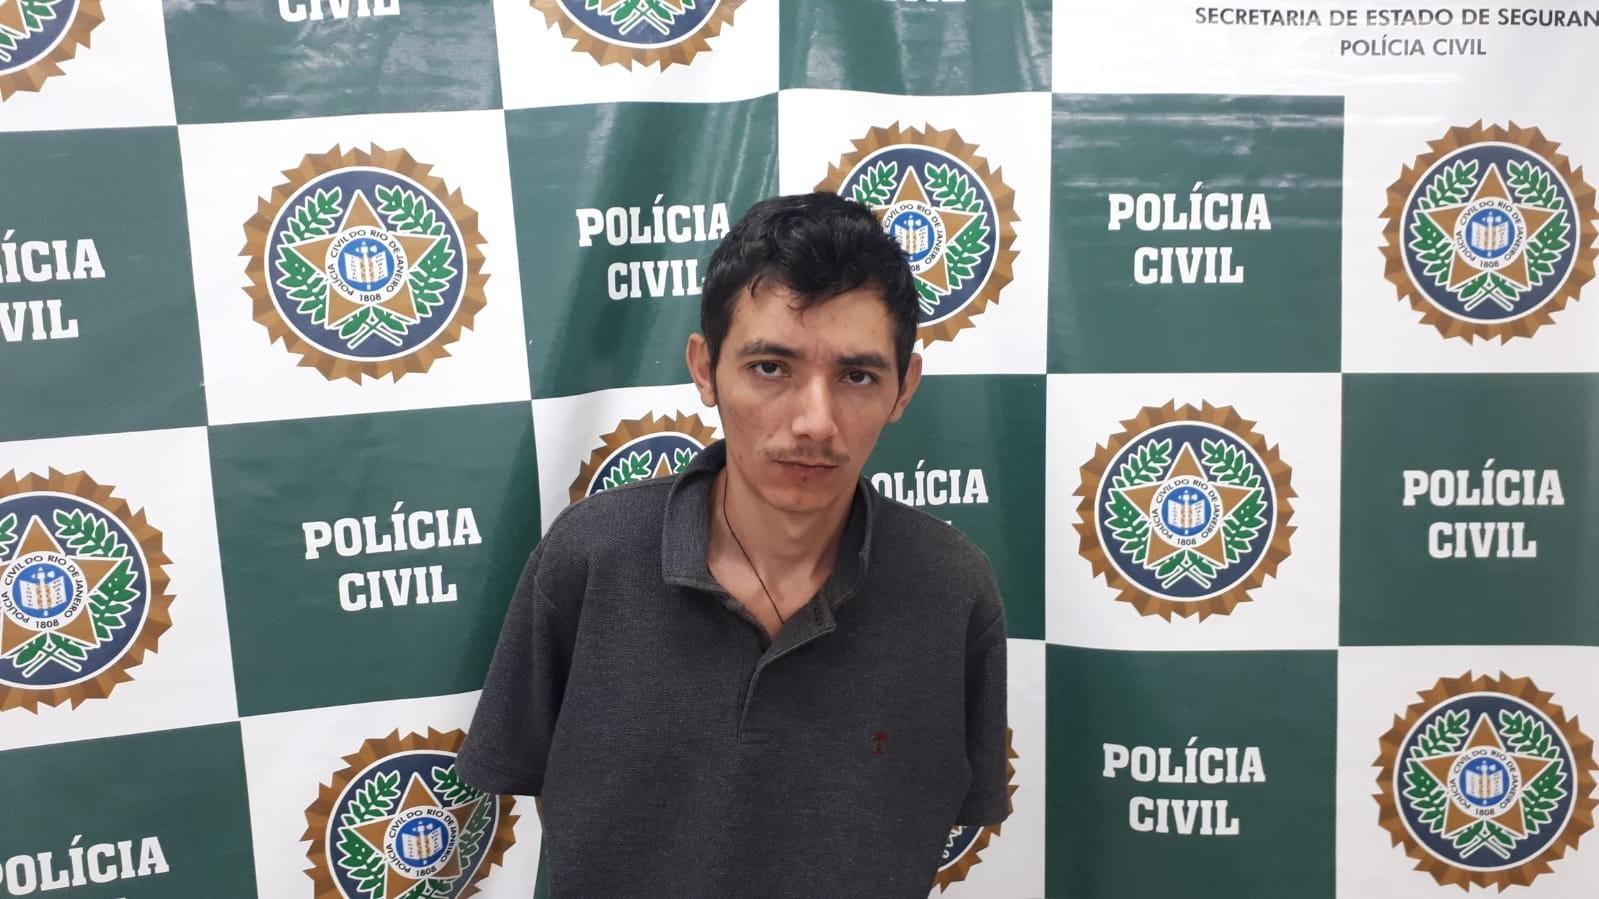 Foragido por homicídio no Ceará é preso no Morro dos Macacos, Rio